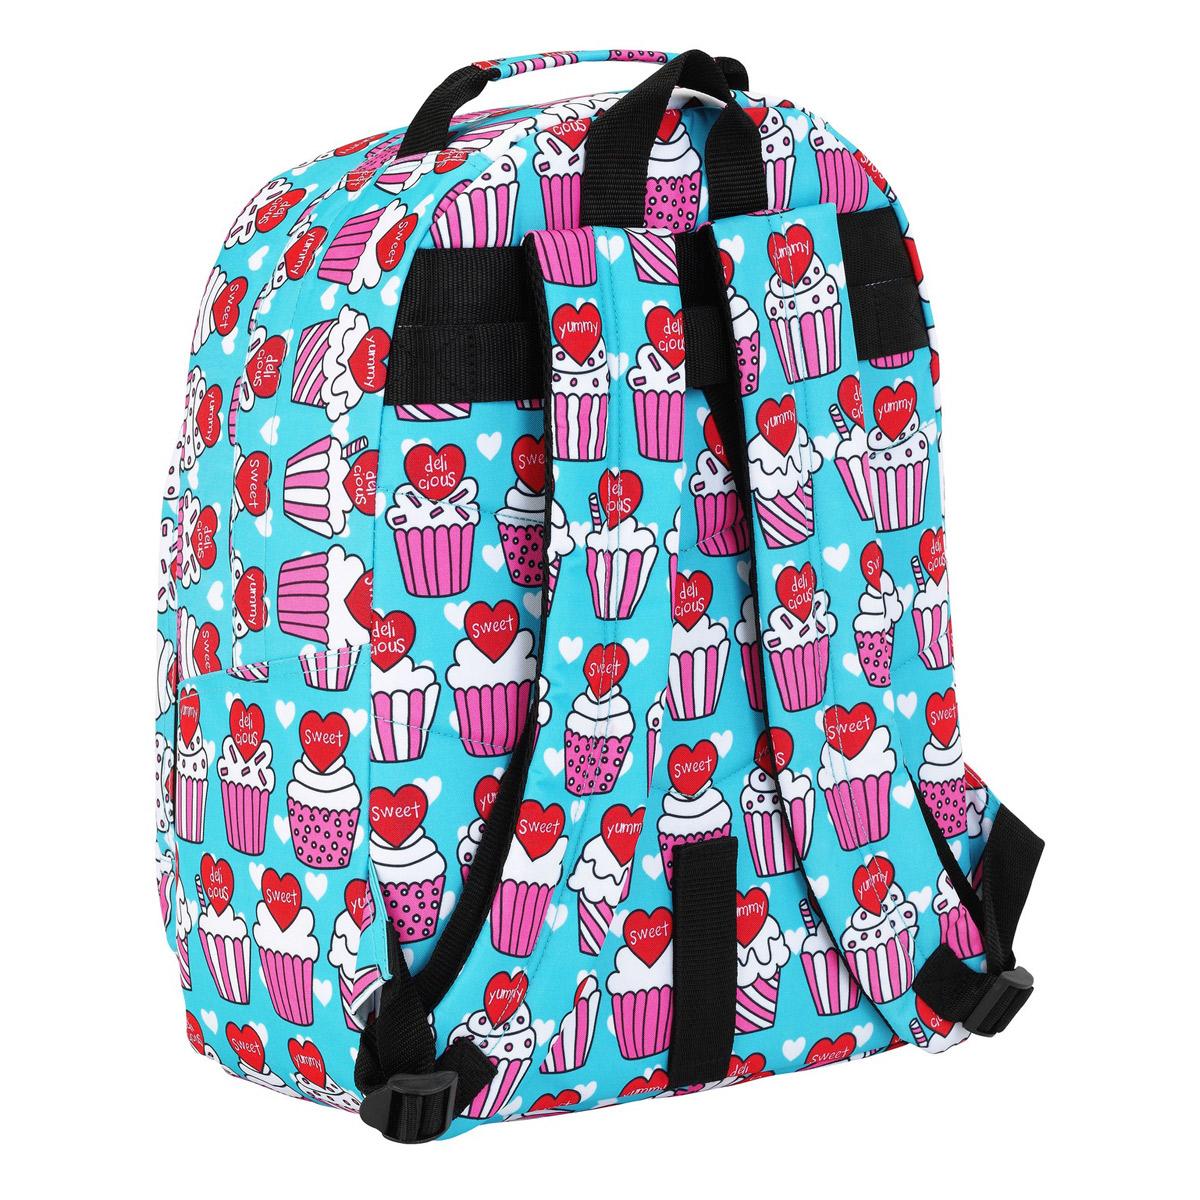 Blackfit8 Yummy Cupcake Large Backpack – image 2